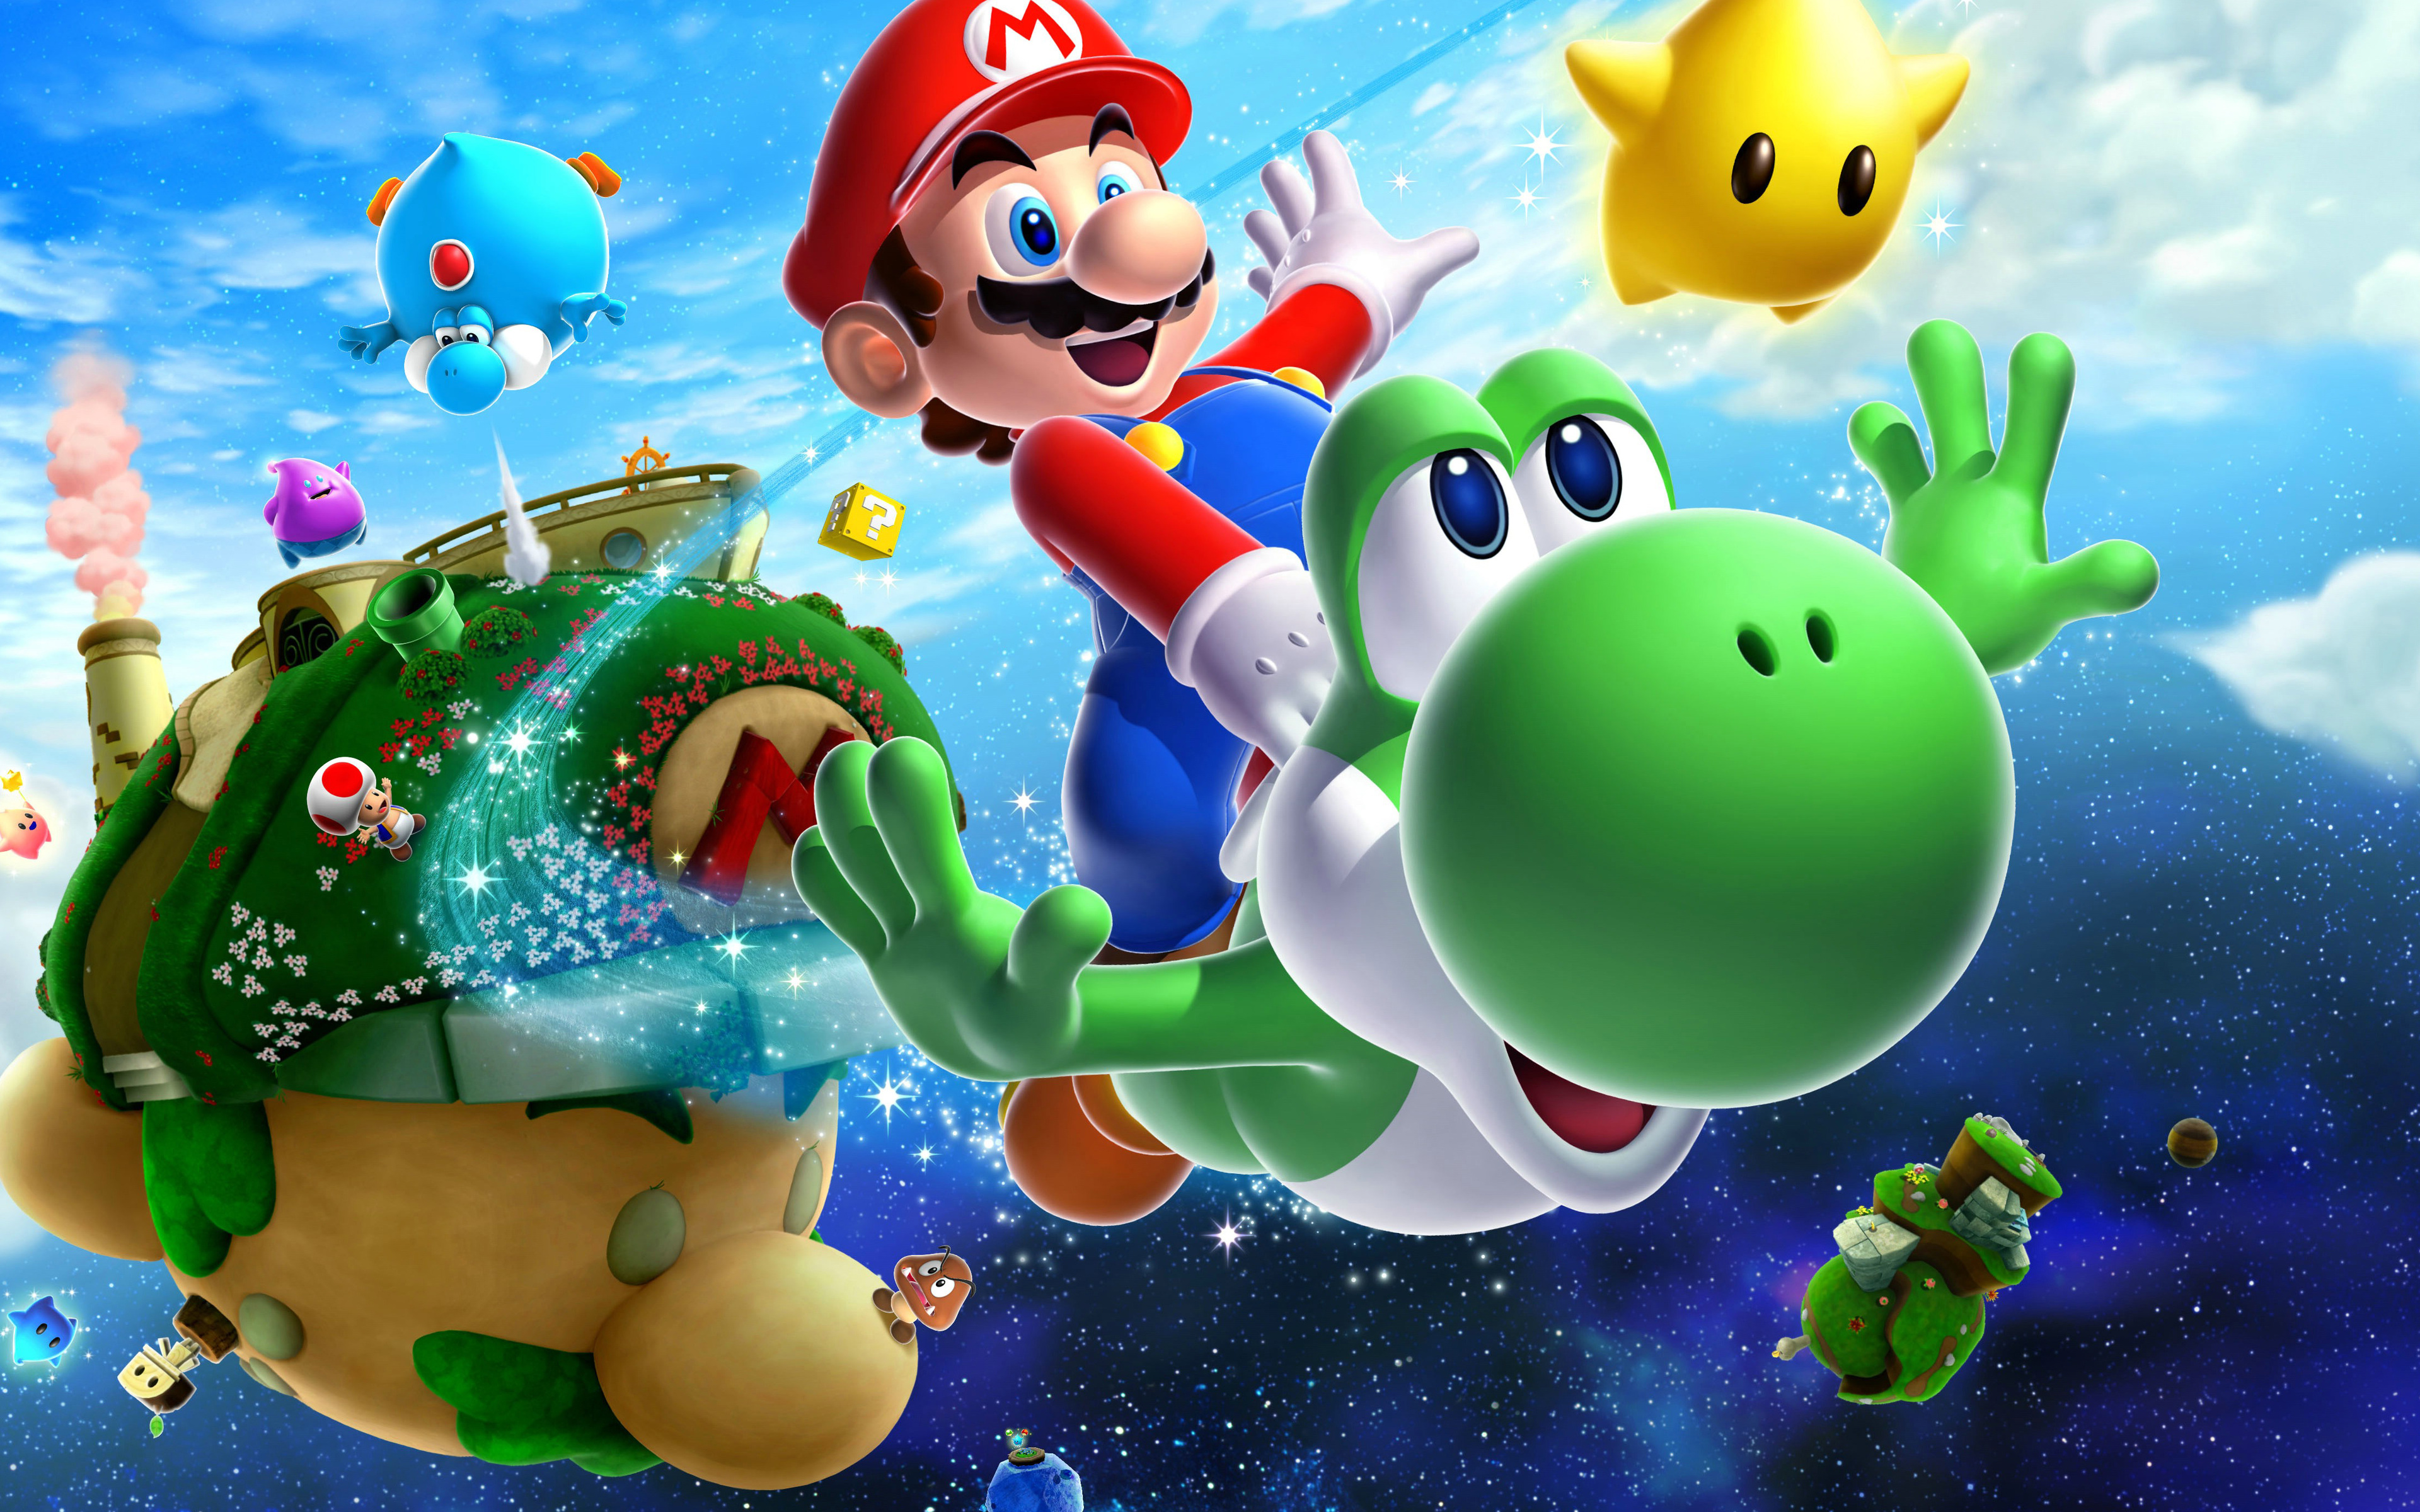 3840x2400 Super Mario Galaxy 2 4k Hd 4k Wallpapers Images